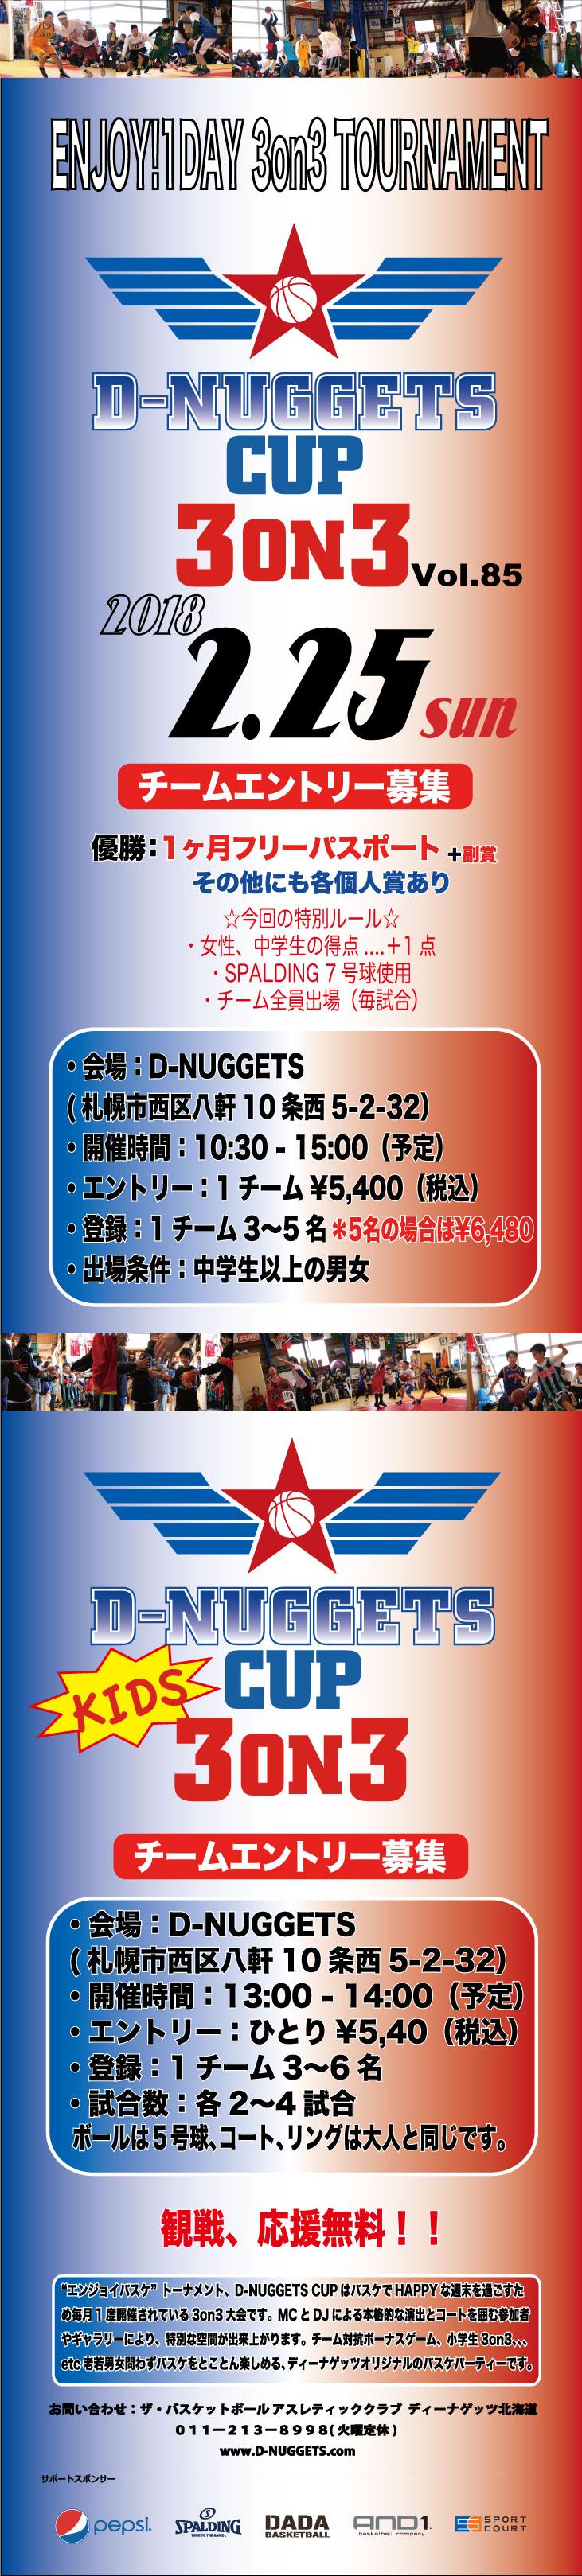 D-NUGGETS-CUP-HOKKAIDO-Vol.85.jpg